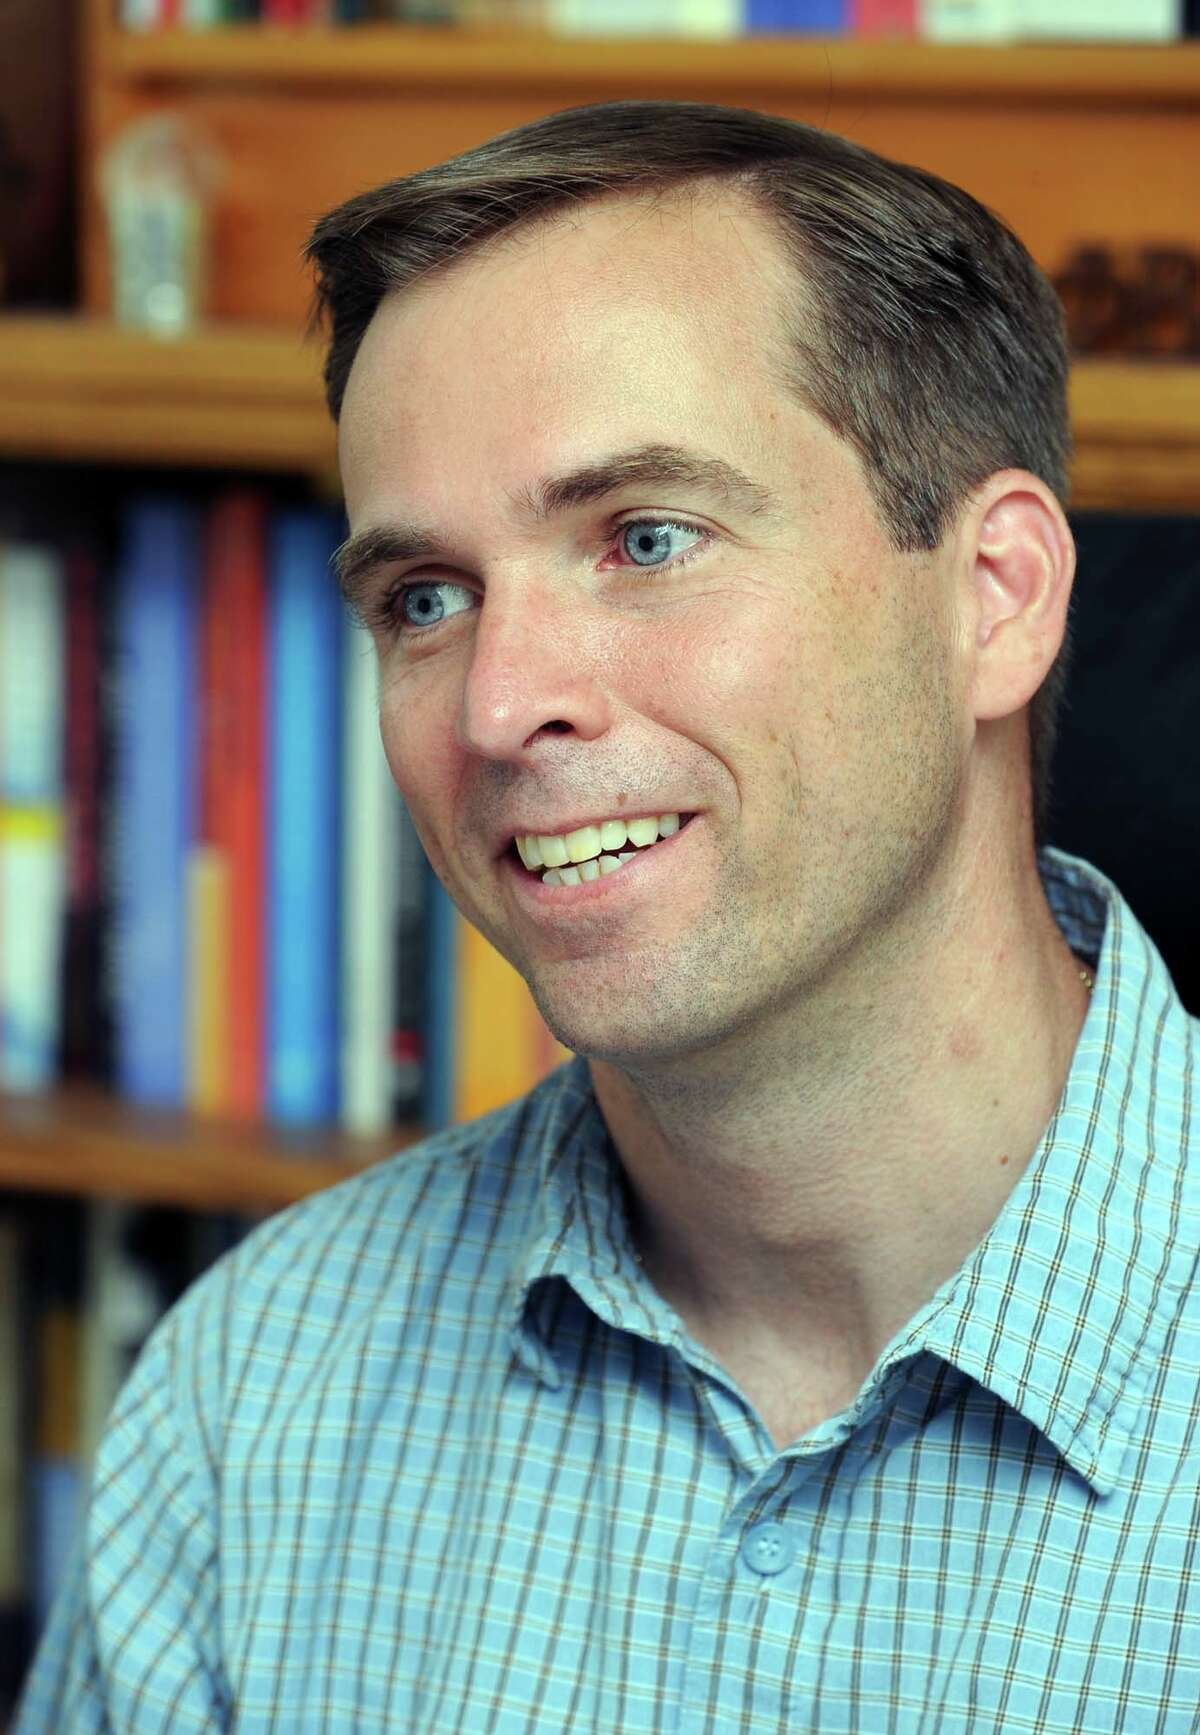 WestConn professor Chris Kukk. Photographed at his home on Monday, July 26, 2010.